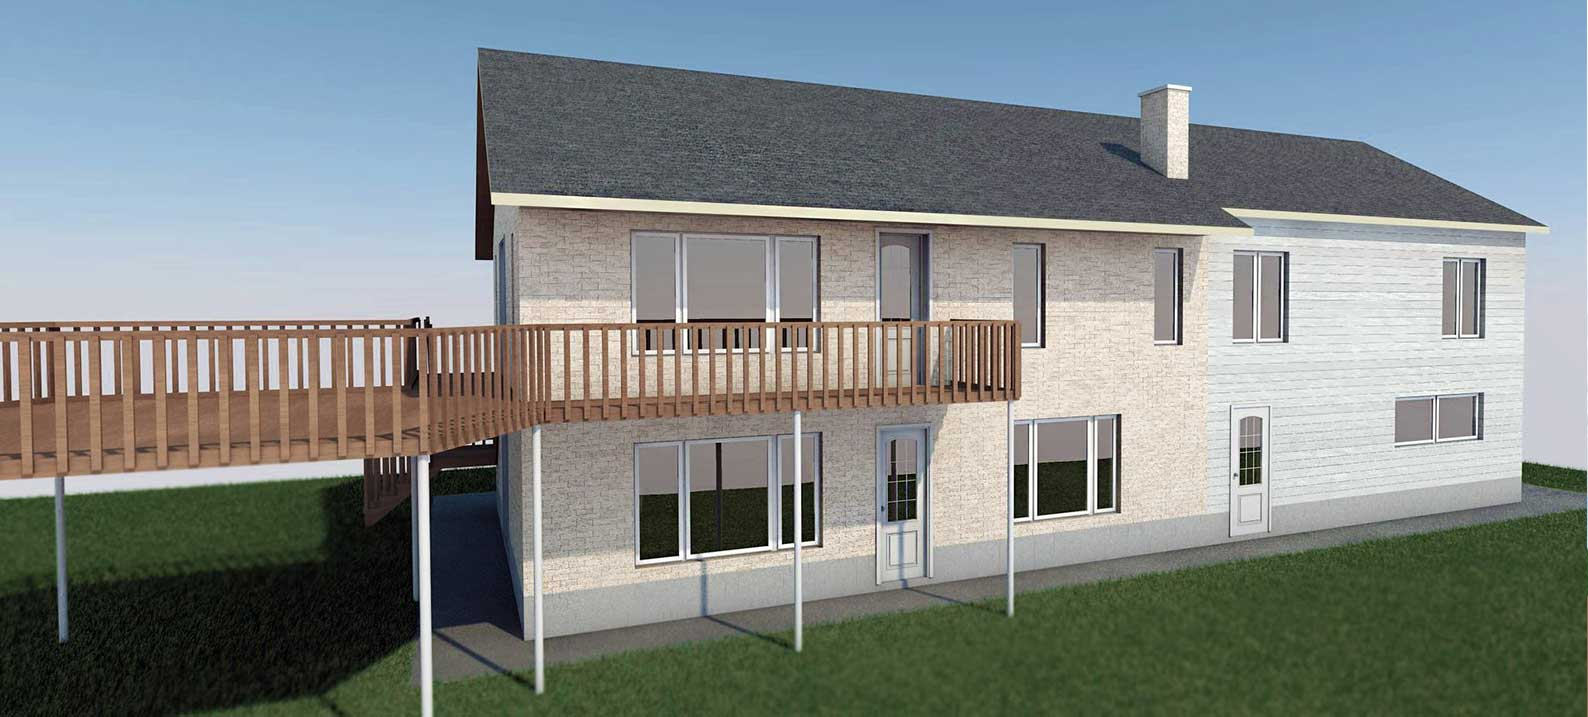 building planner - Home Building Planner